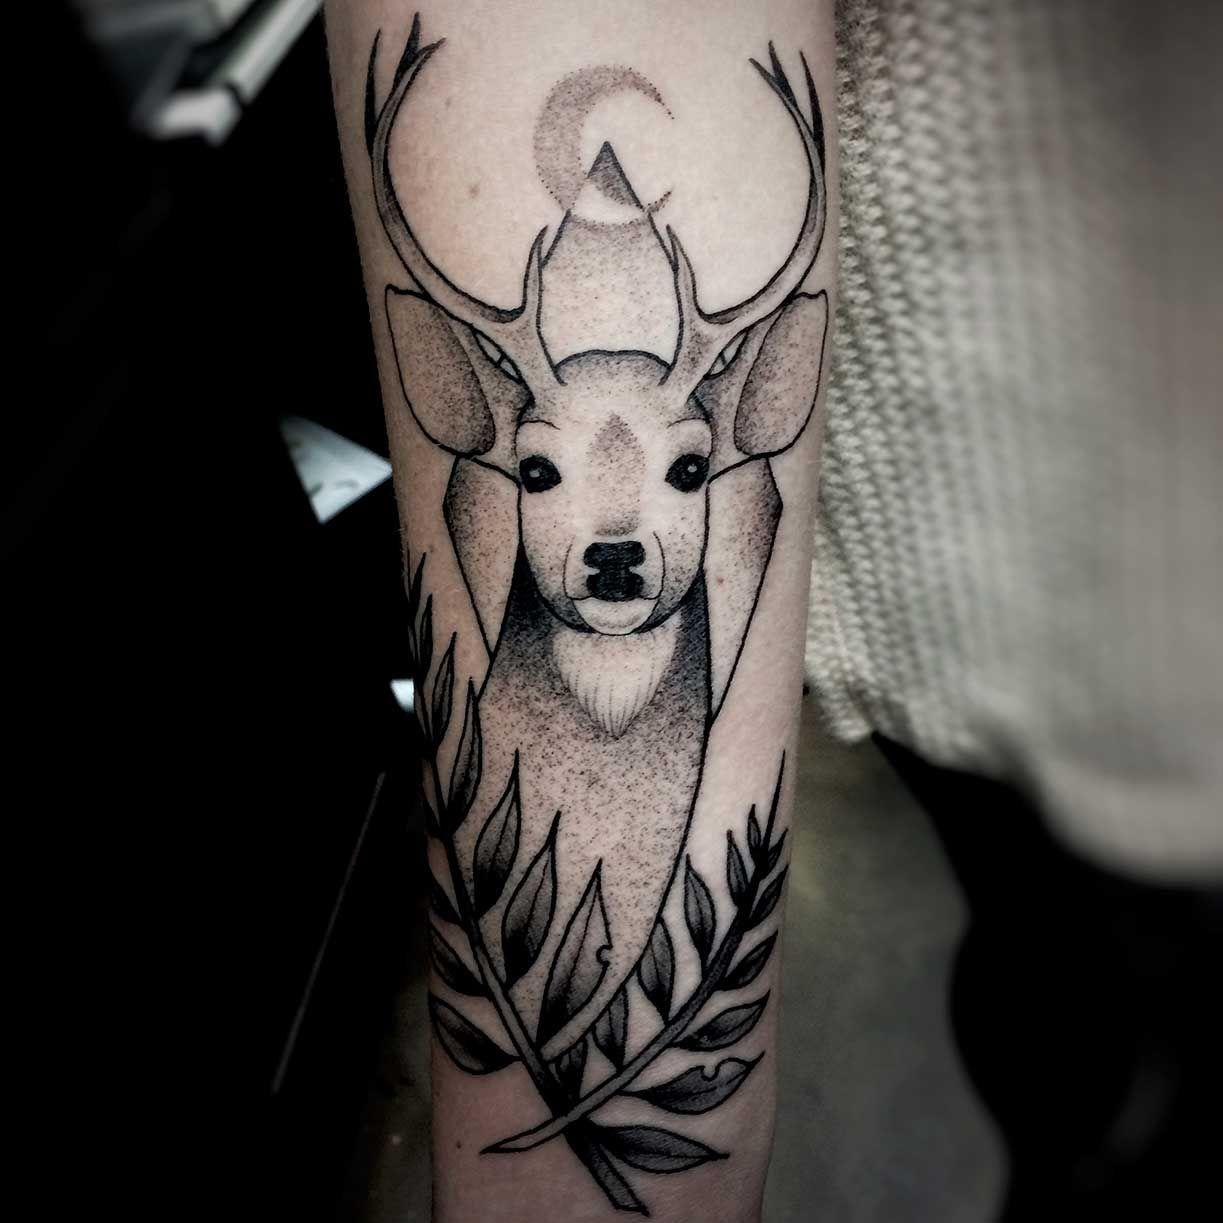 Ian-Spong-Pure-Ink-Tattoo-Deer.jpg (1223×1223)